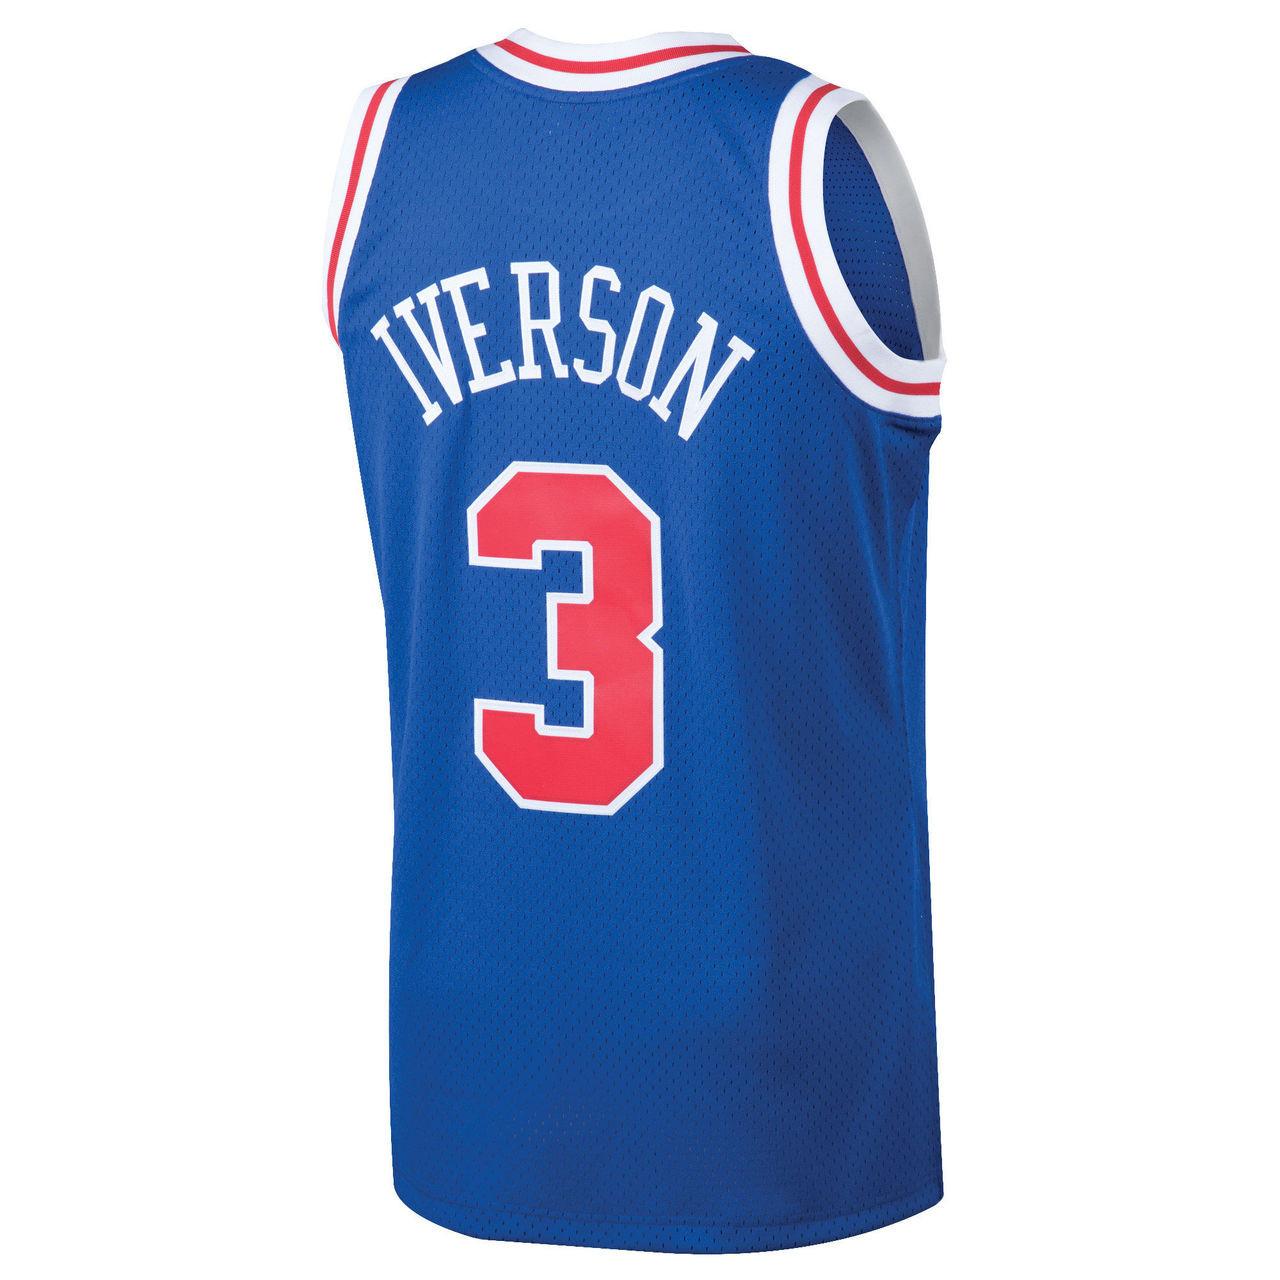 online store f4a37 4e3e8 Allen Iverson Philadelphia 76ers Mitchell & Ness 1996-97 Hardwood Classics  Swingman Jersey - Royal